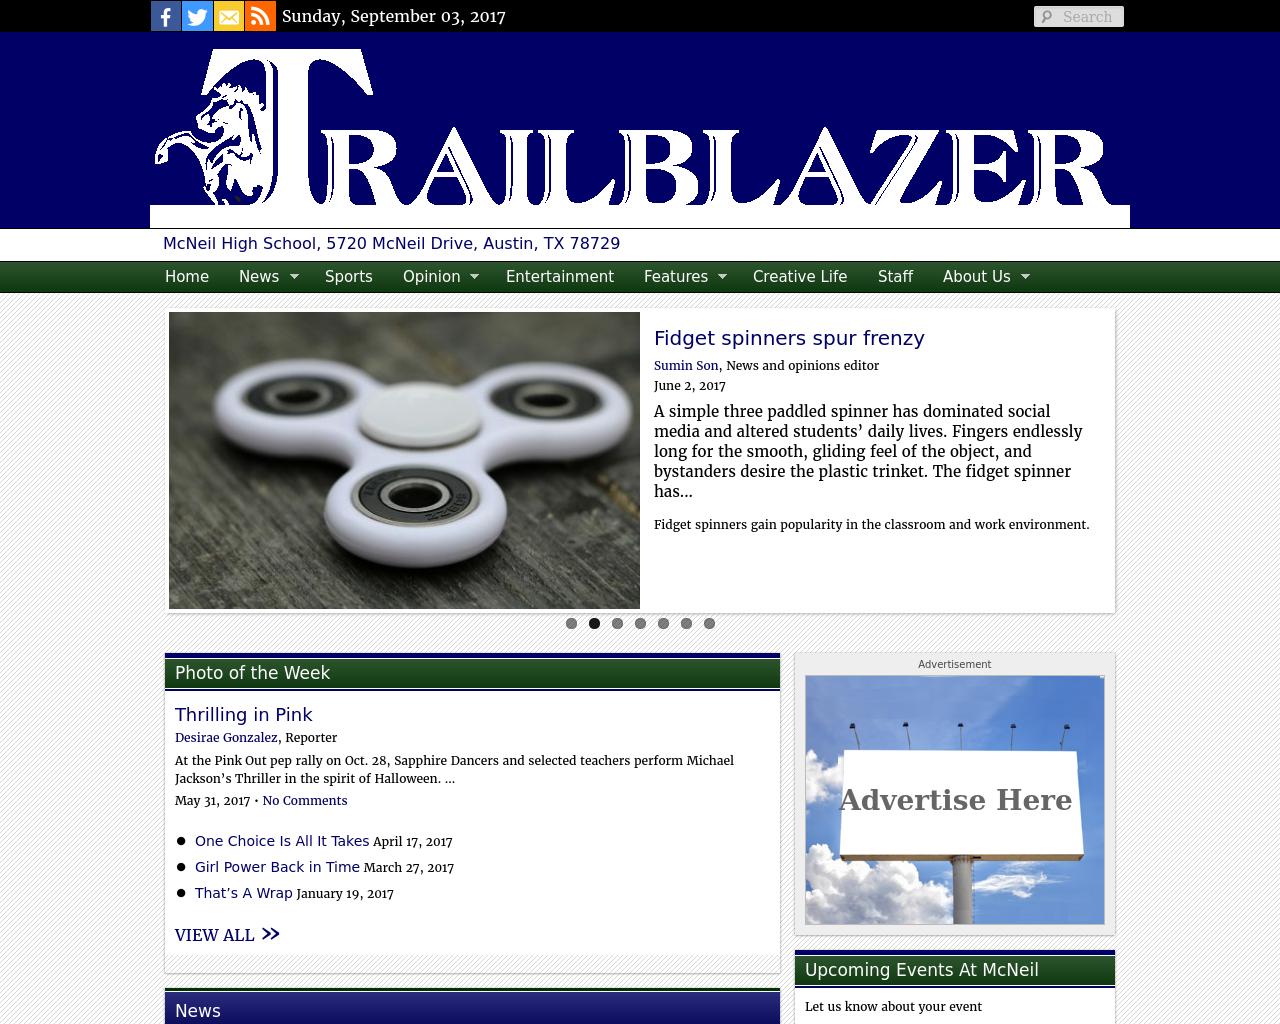 Trailblazer-Advertising-Reviews-Pricing